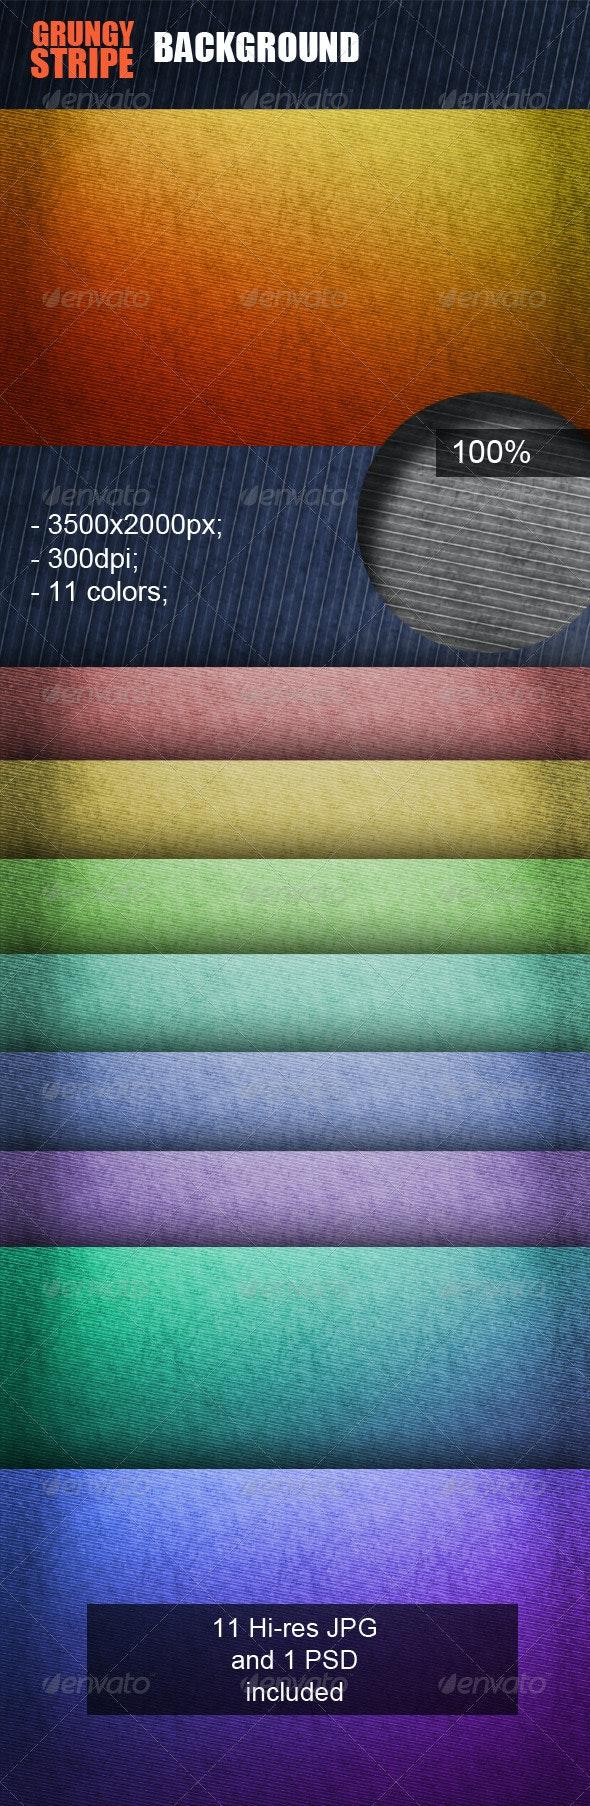 Grungy Stripe Background - Patterns Backgrounds